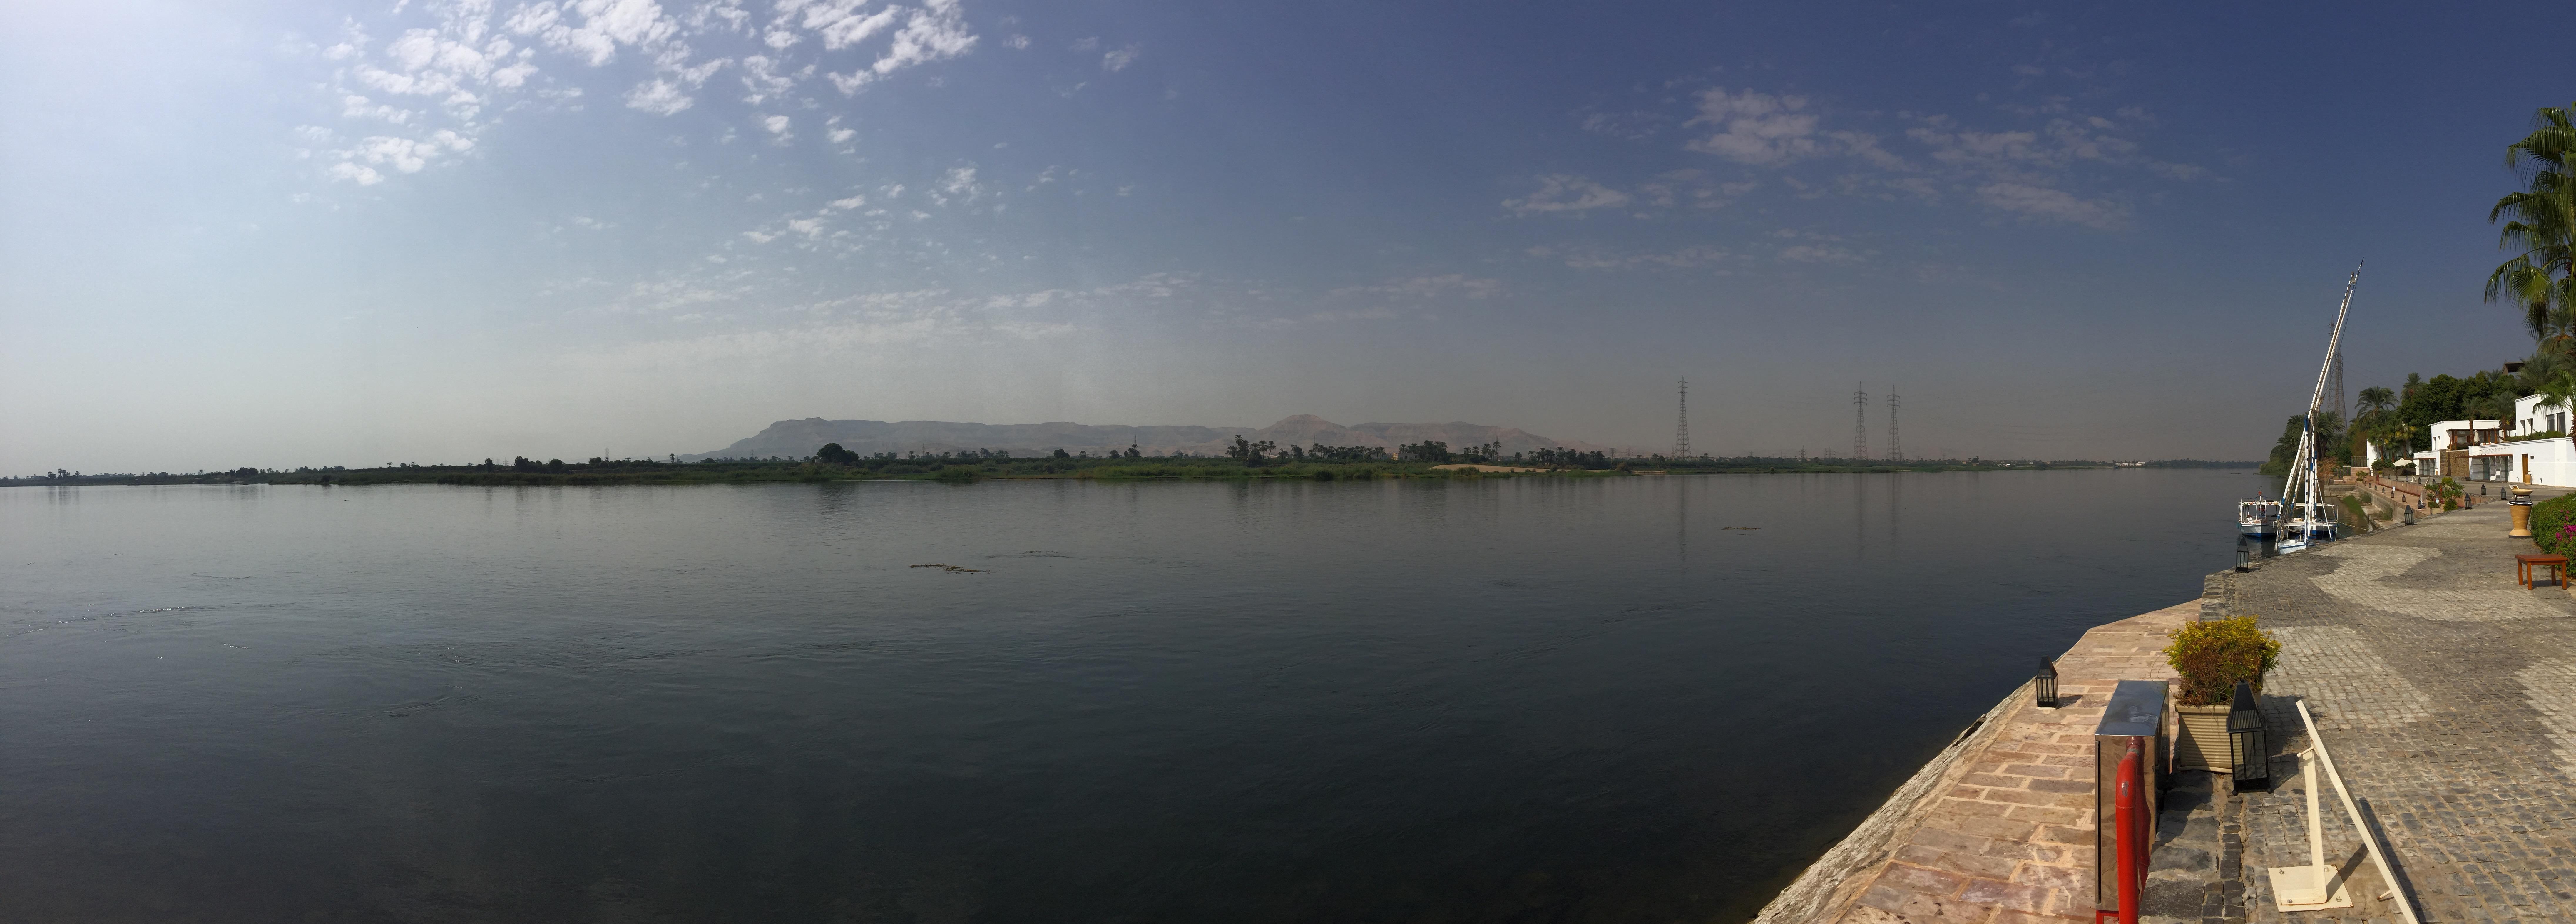 Pano-Nil